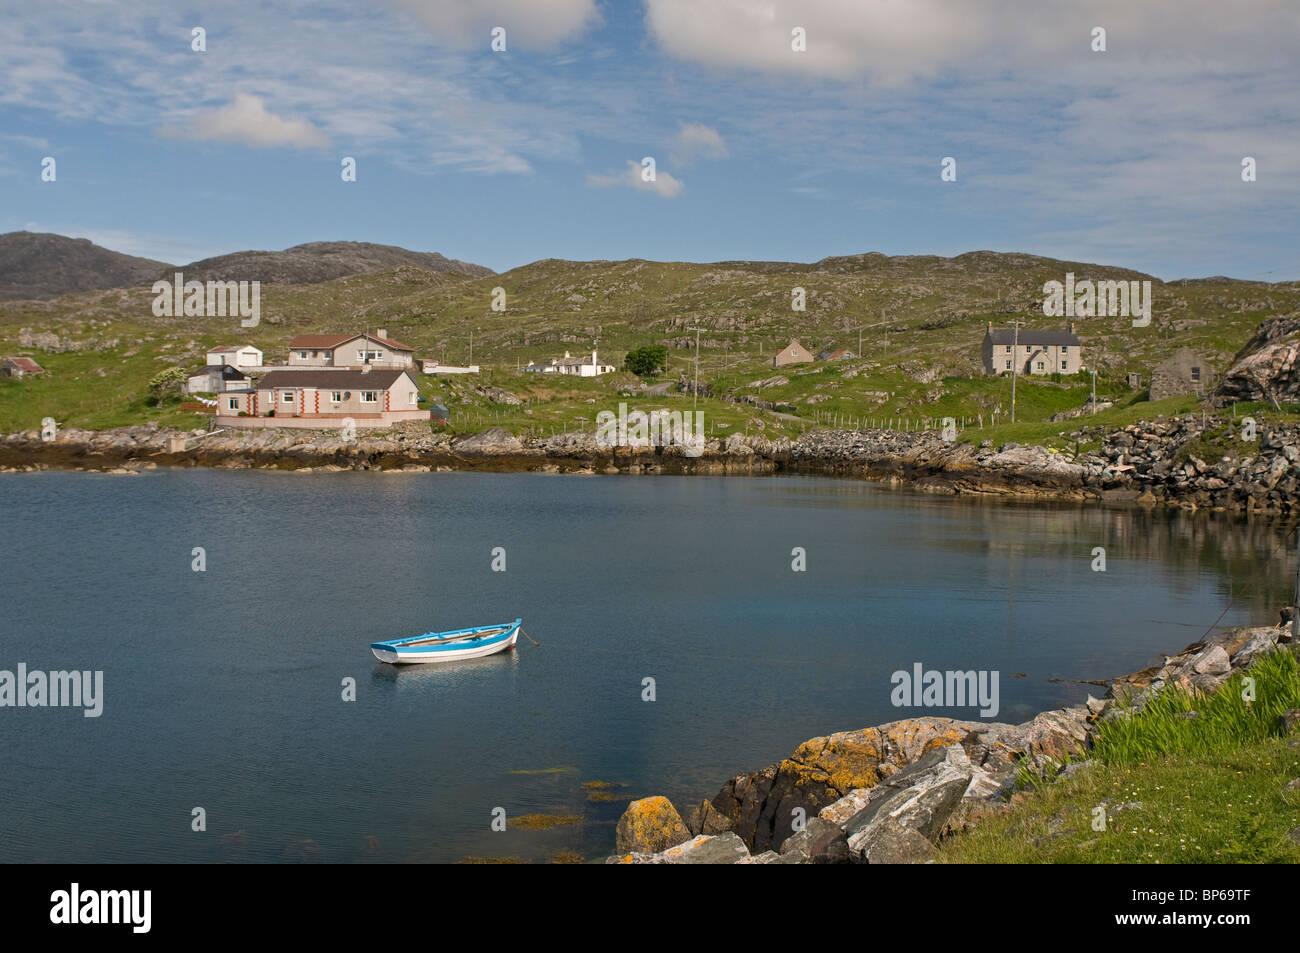 Geocrab on the Isle of Harris, Western Isles, Scotland.  SCO 6318 - Stock Image